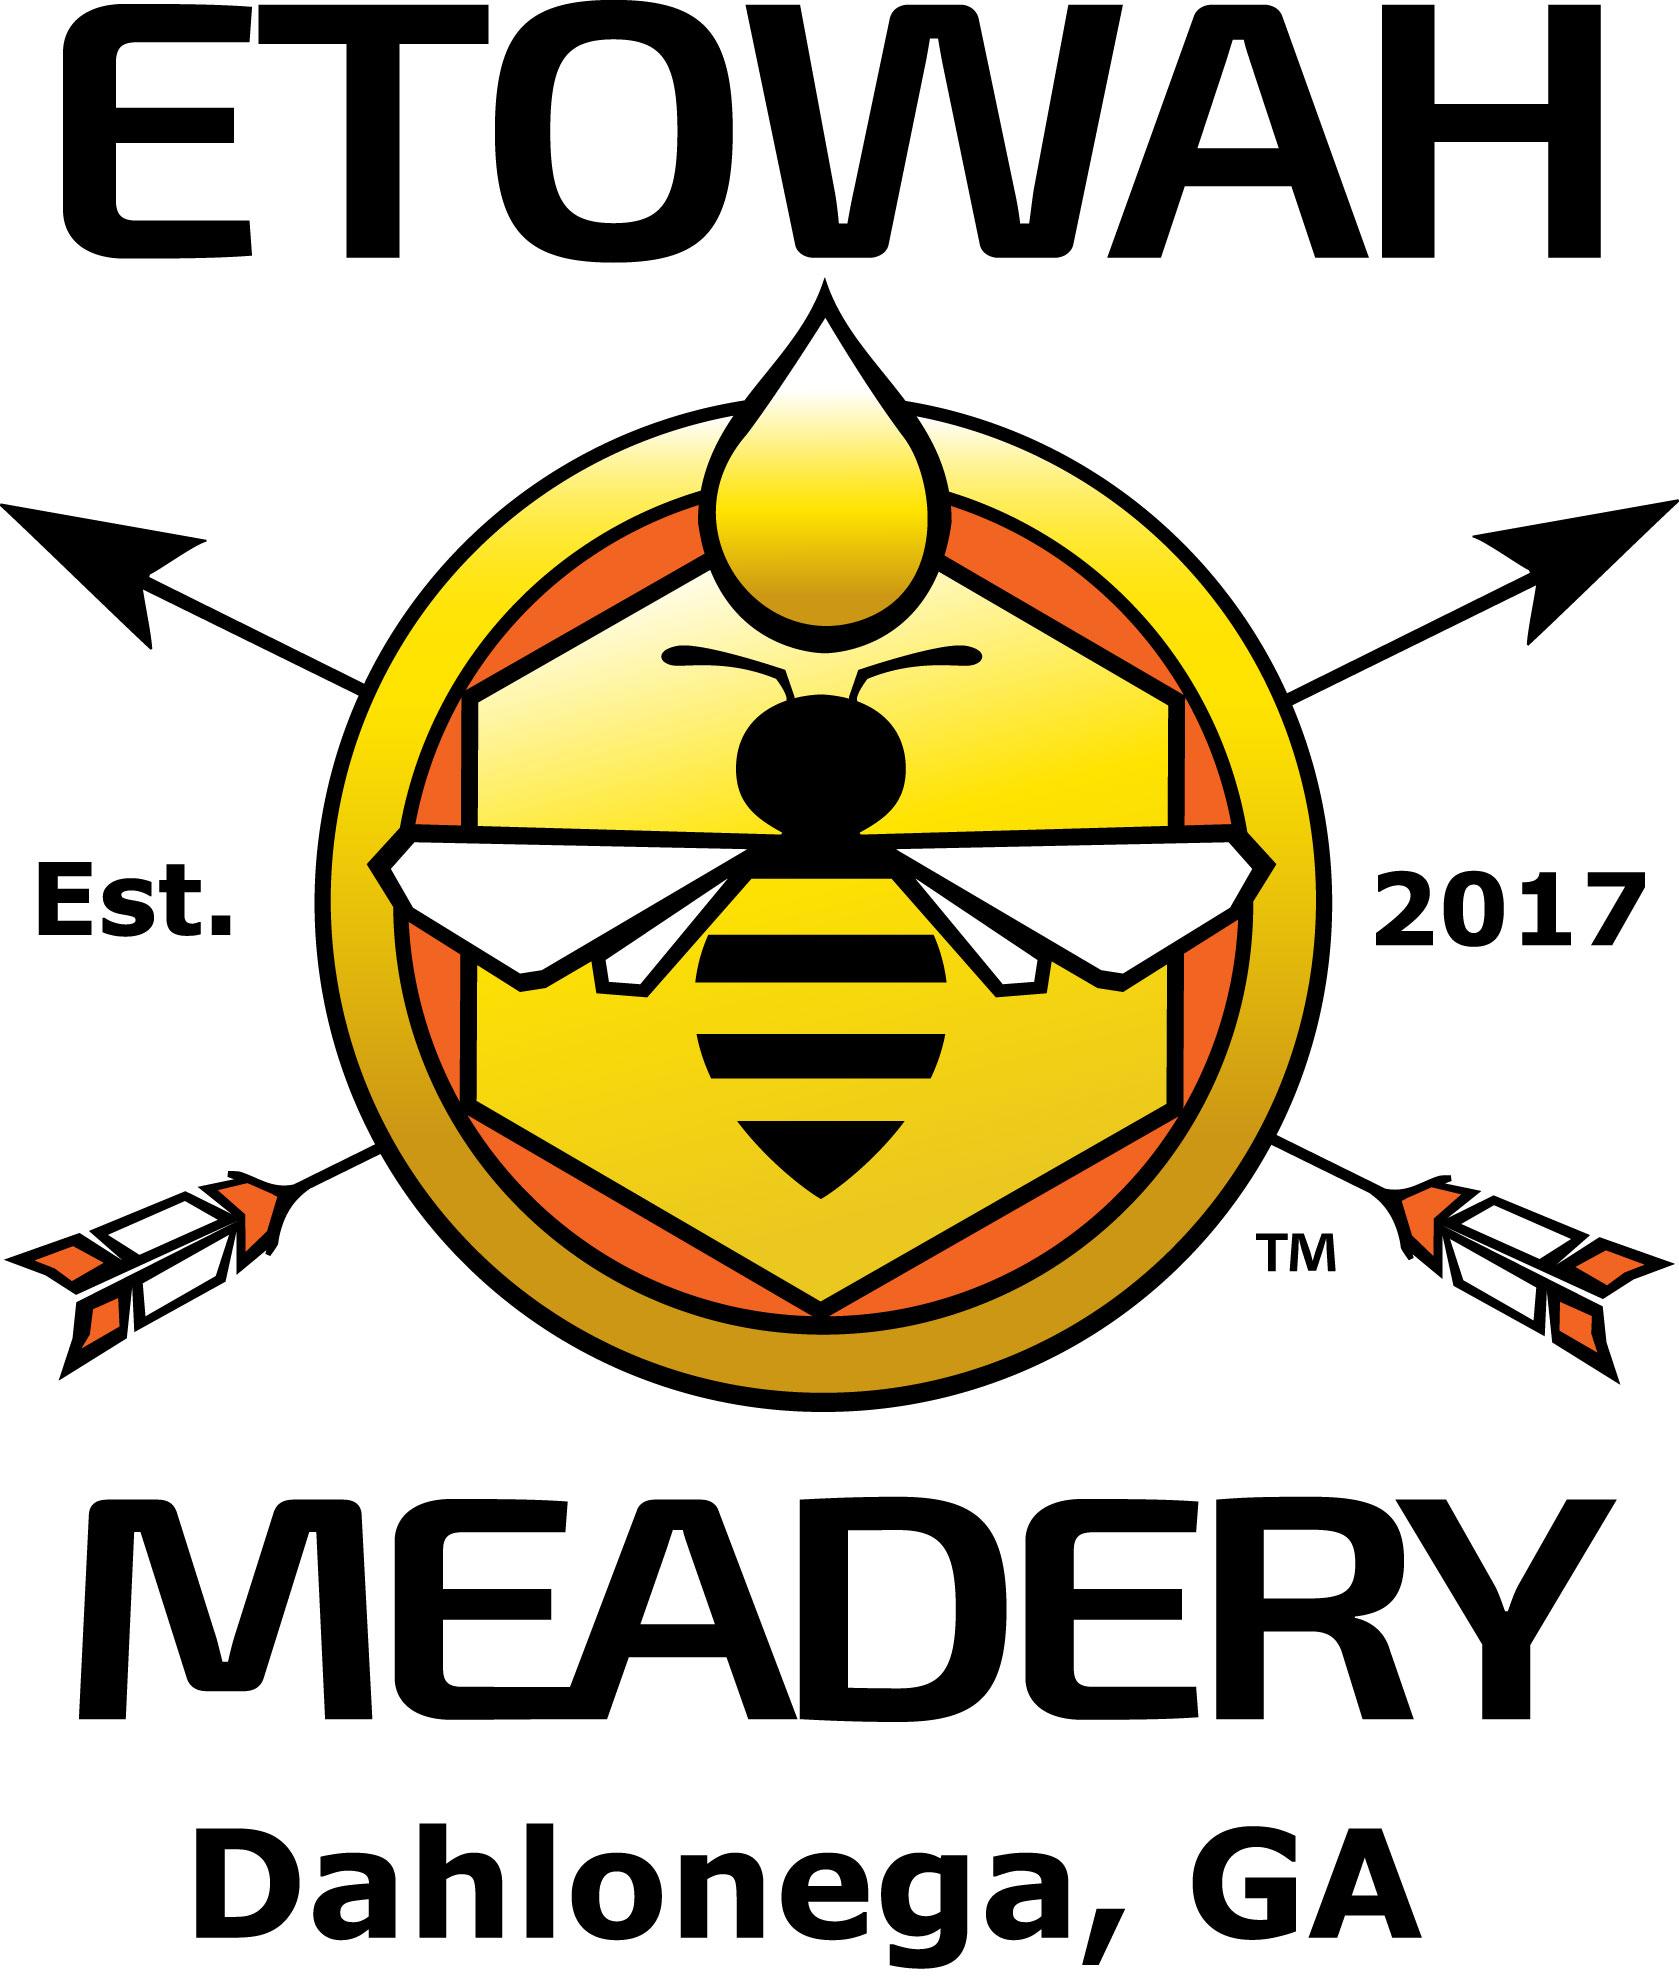 EM Final logo Square with Dahlonega.jpg